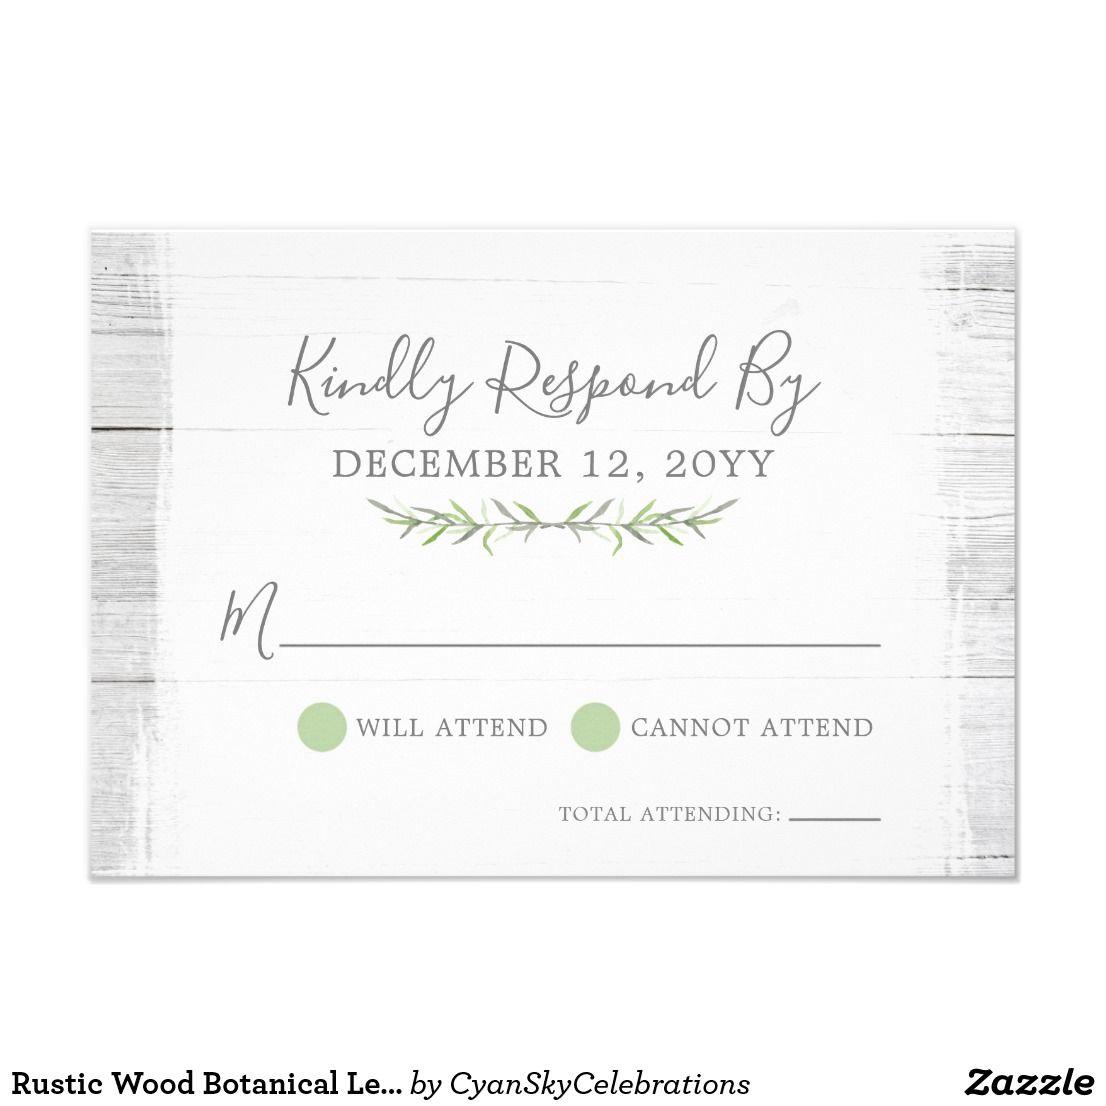 Rustic Wood Botanical Leaf Wedding Invitation RSVP by ...